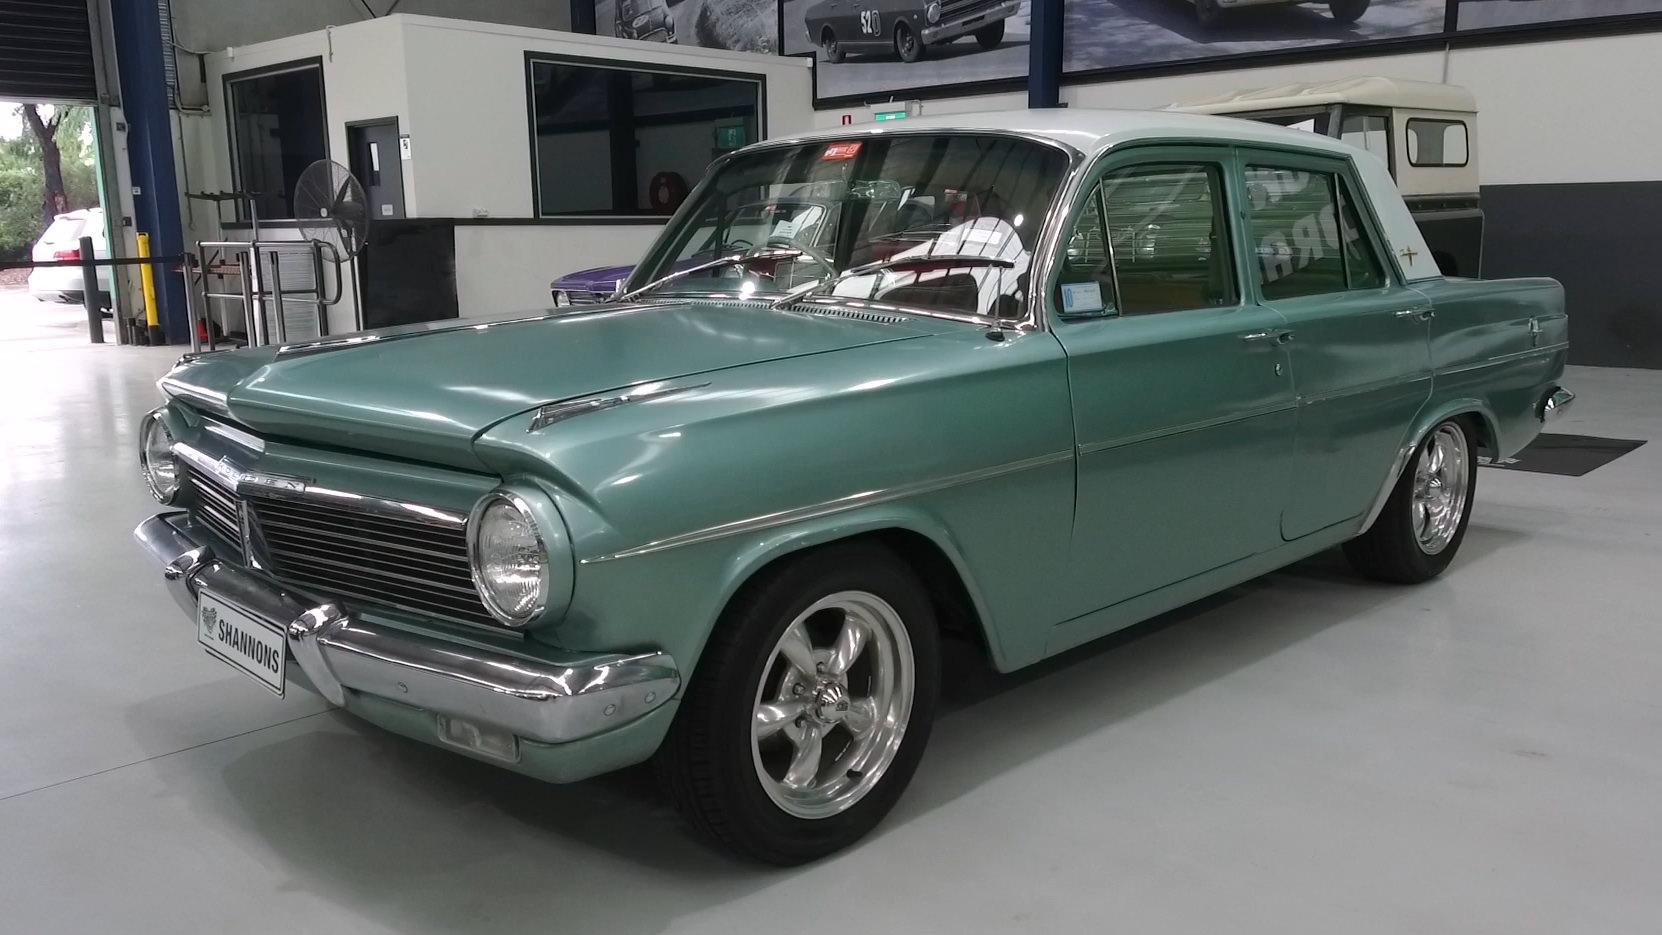 1965 Holden EH Premier Sedan (Modified) - 2021 Shannons Winter Timed Online Auction